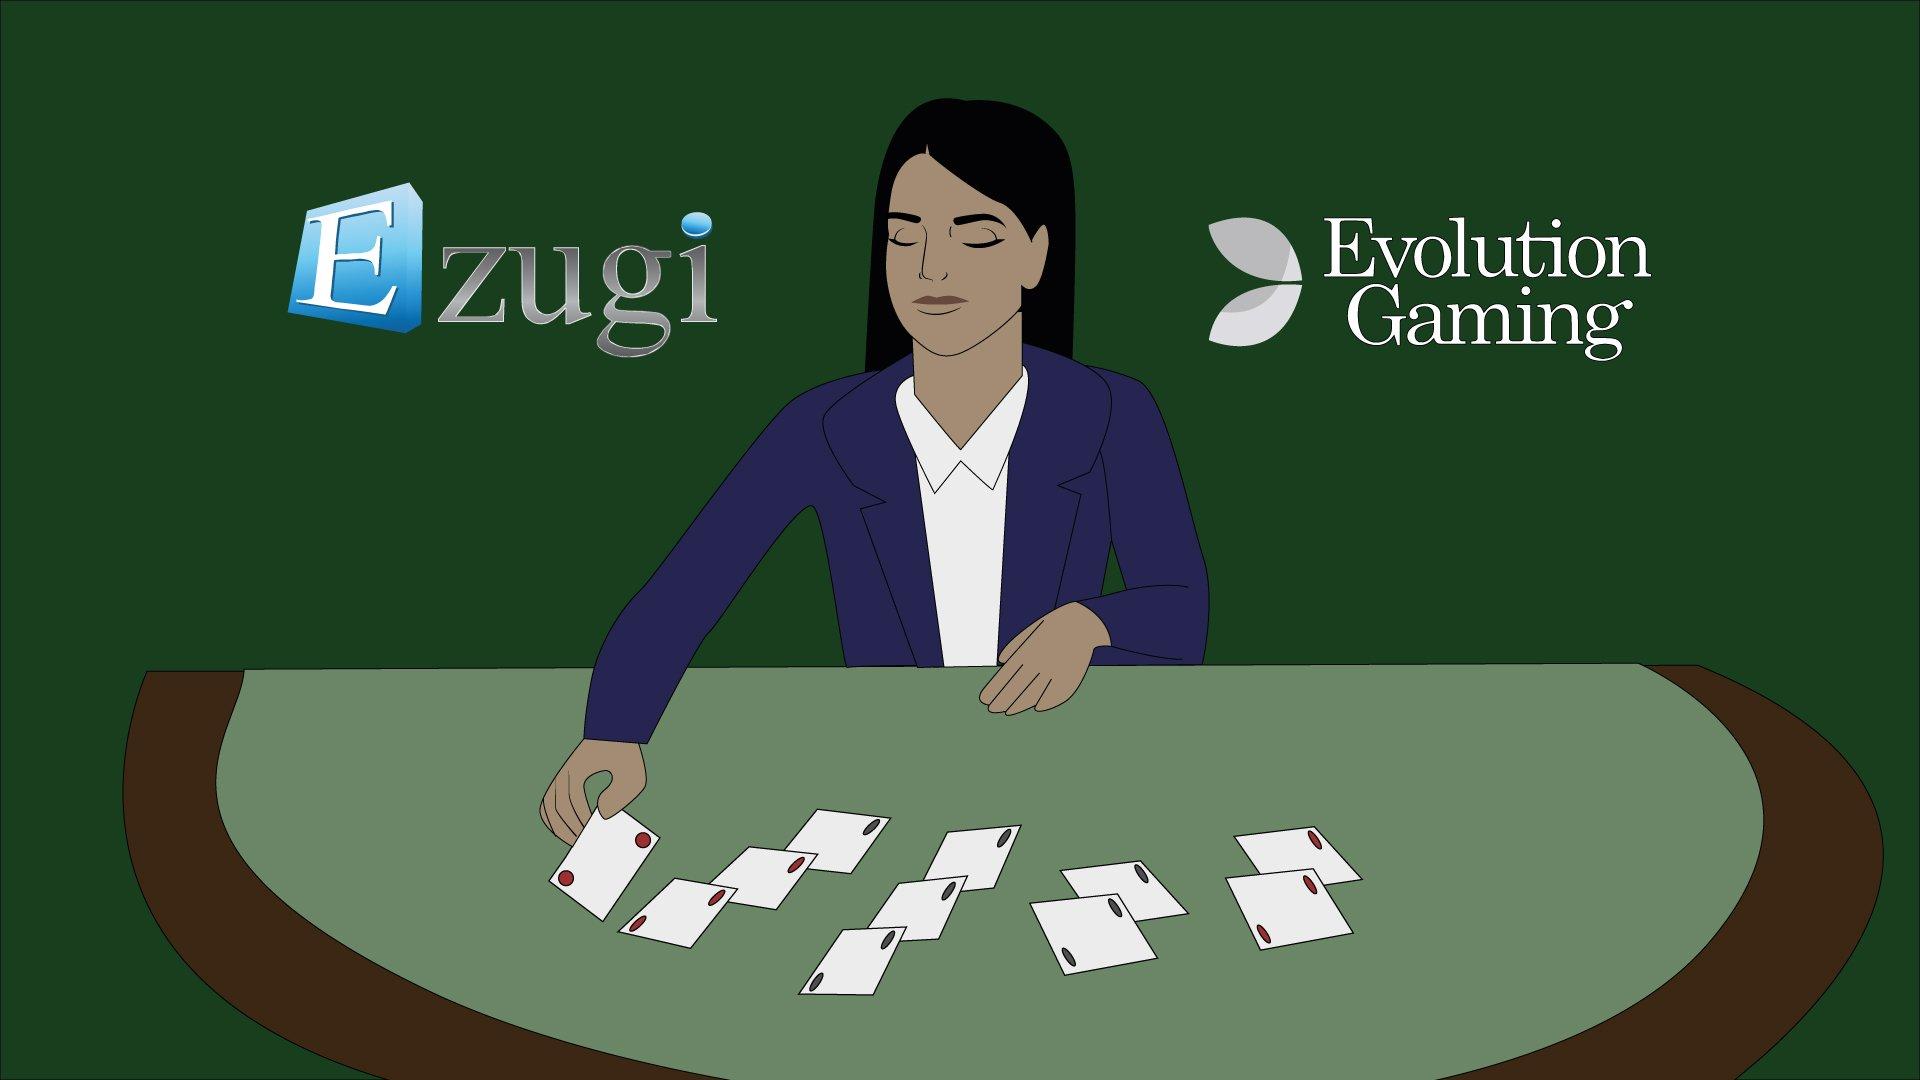 Evolution Gaming solmi sopimuksen Ezugin kanssa